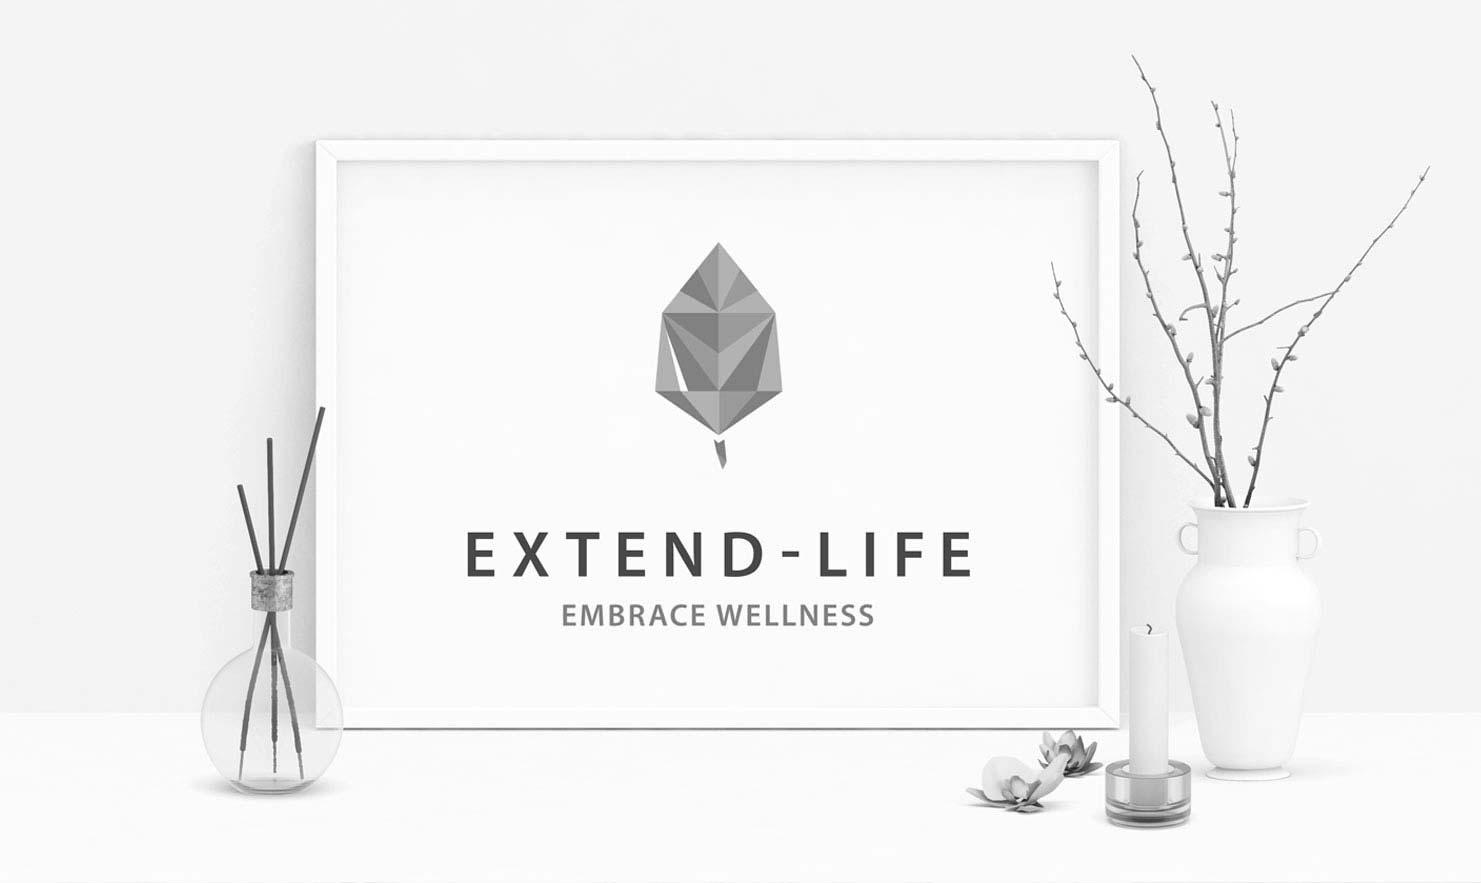 Extend-Life